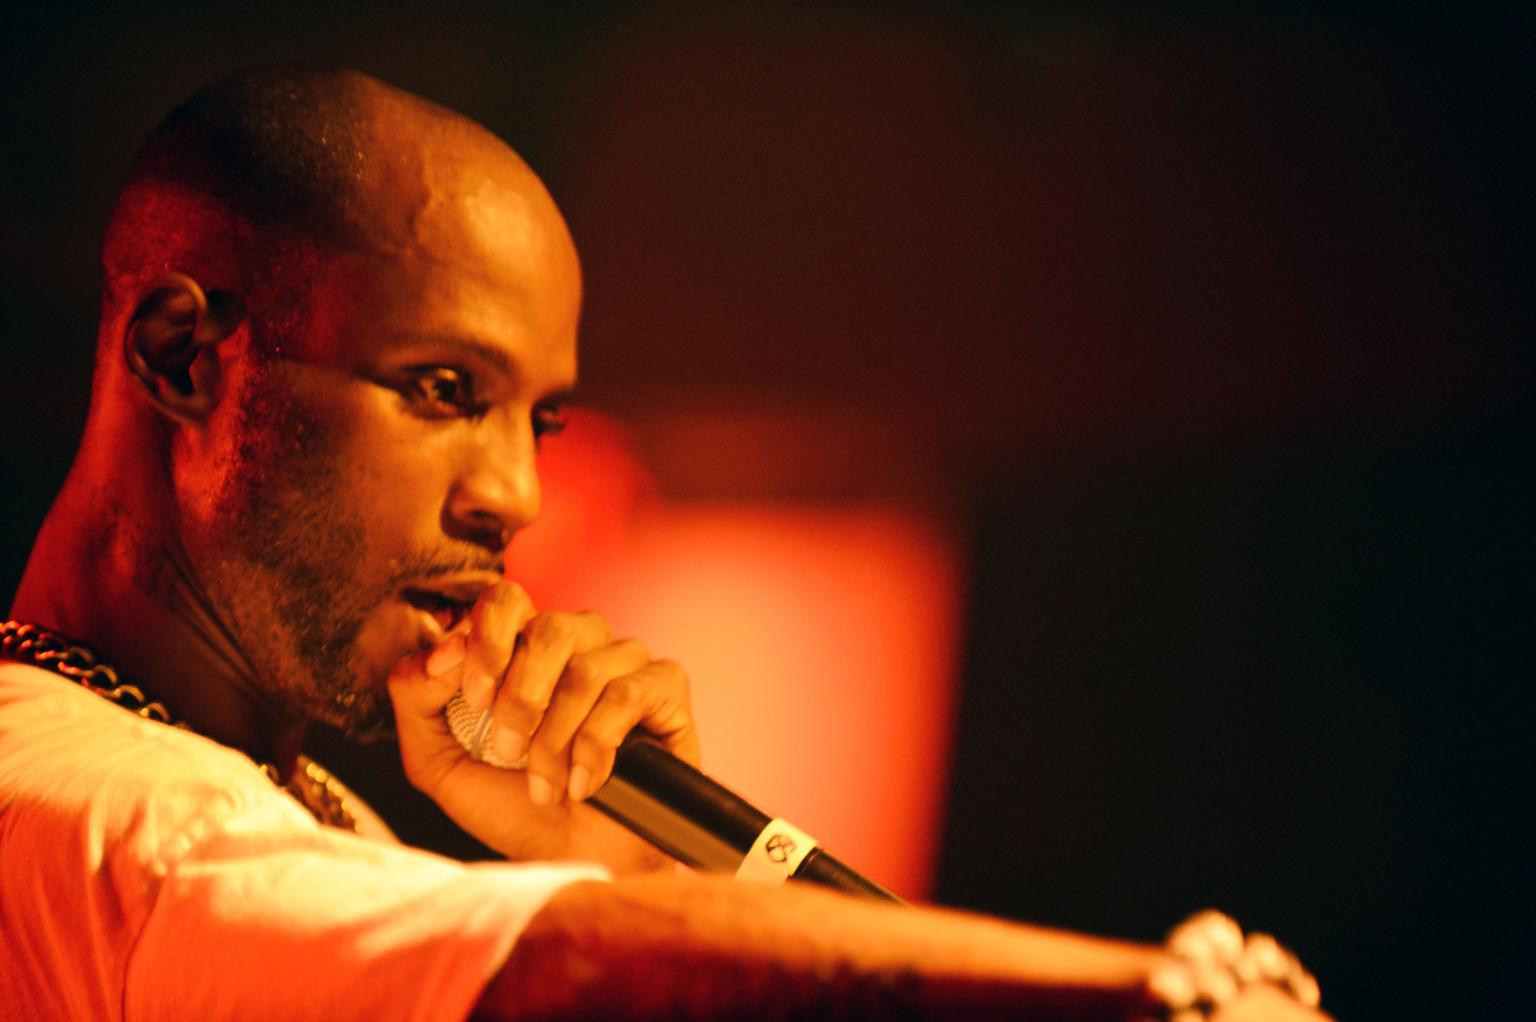 DMX: Rapper Sentenced to 6 Months in Jail